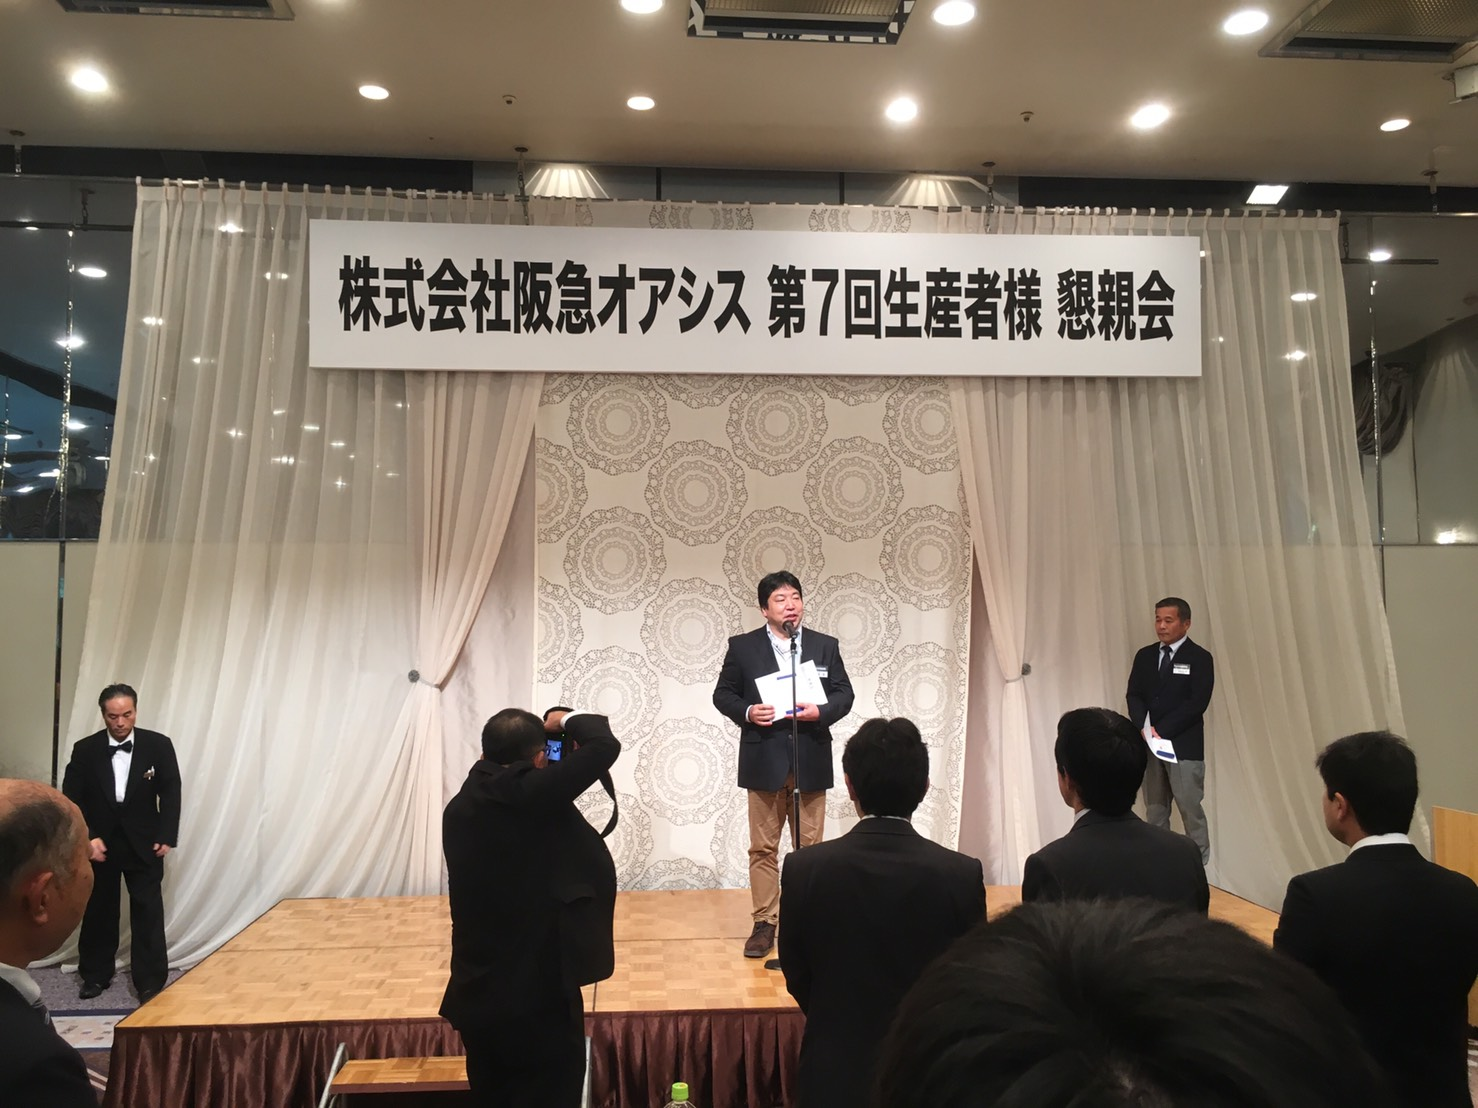 20161122 阪急オアシス生産者懇談会 (1)